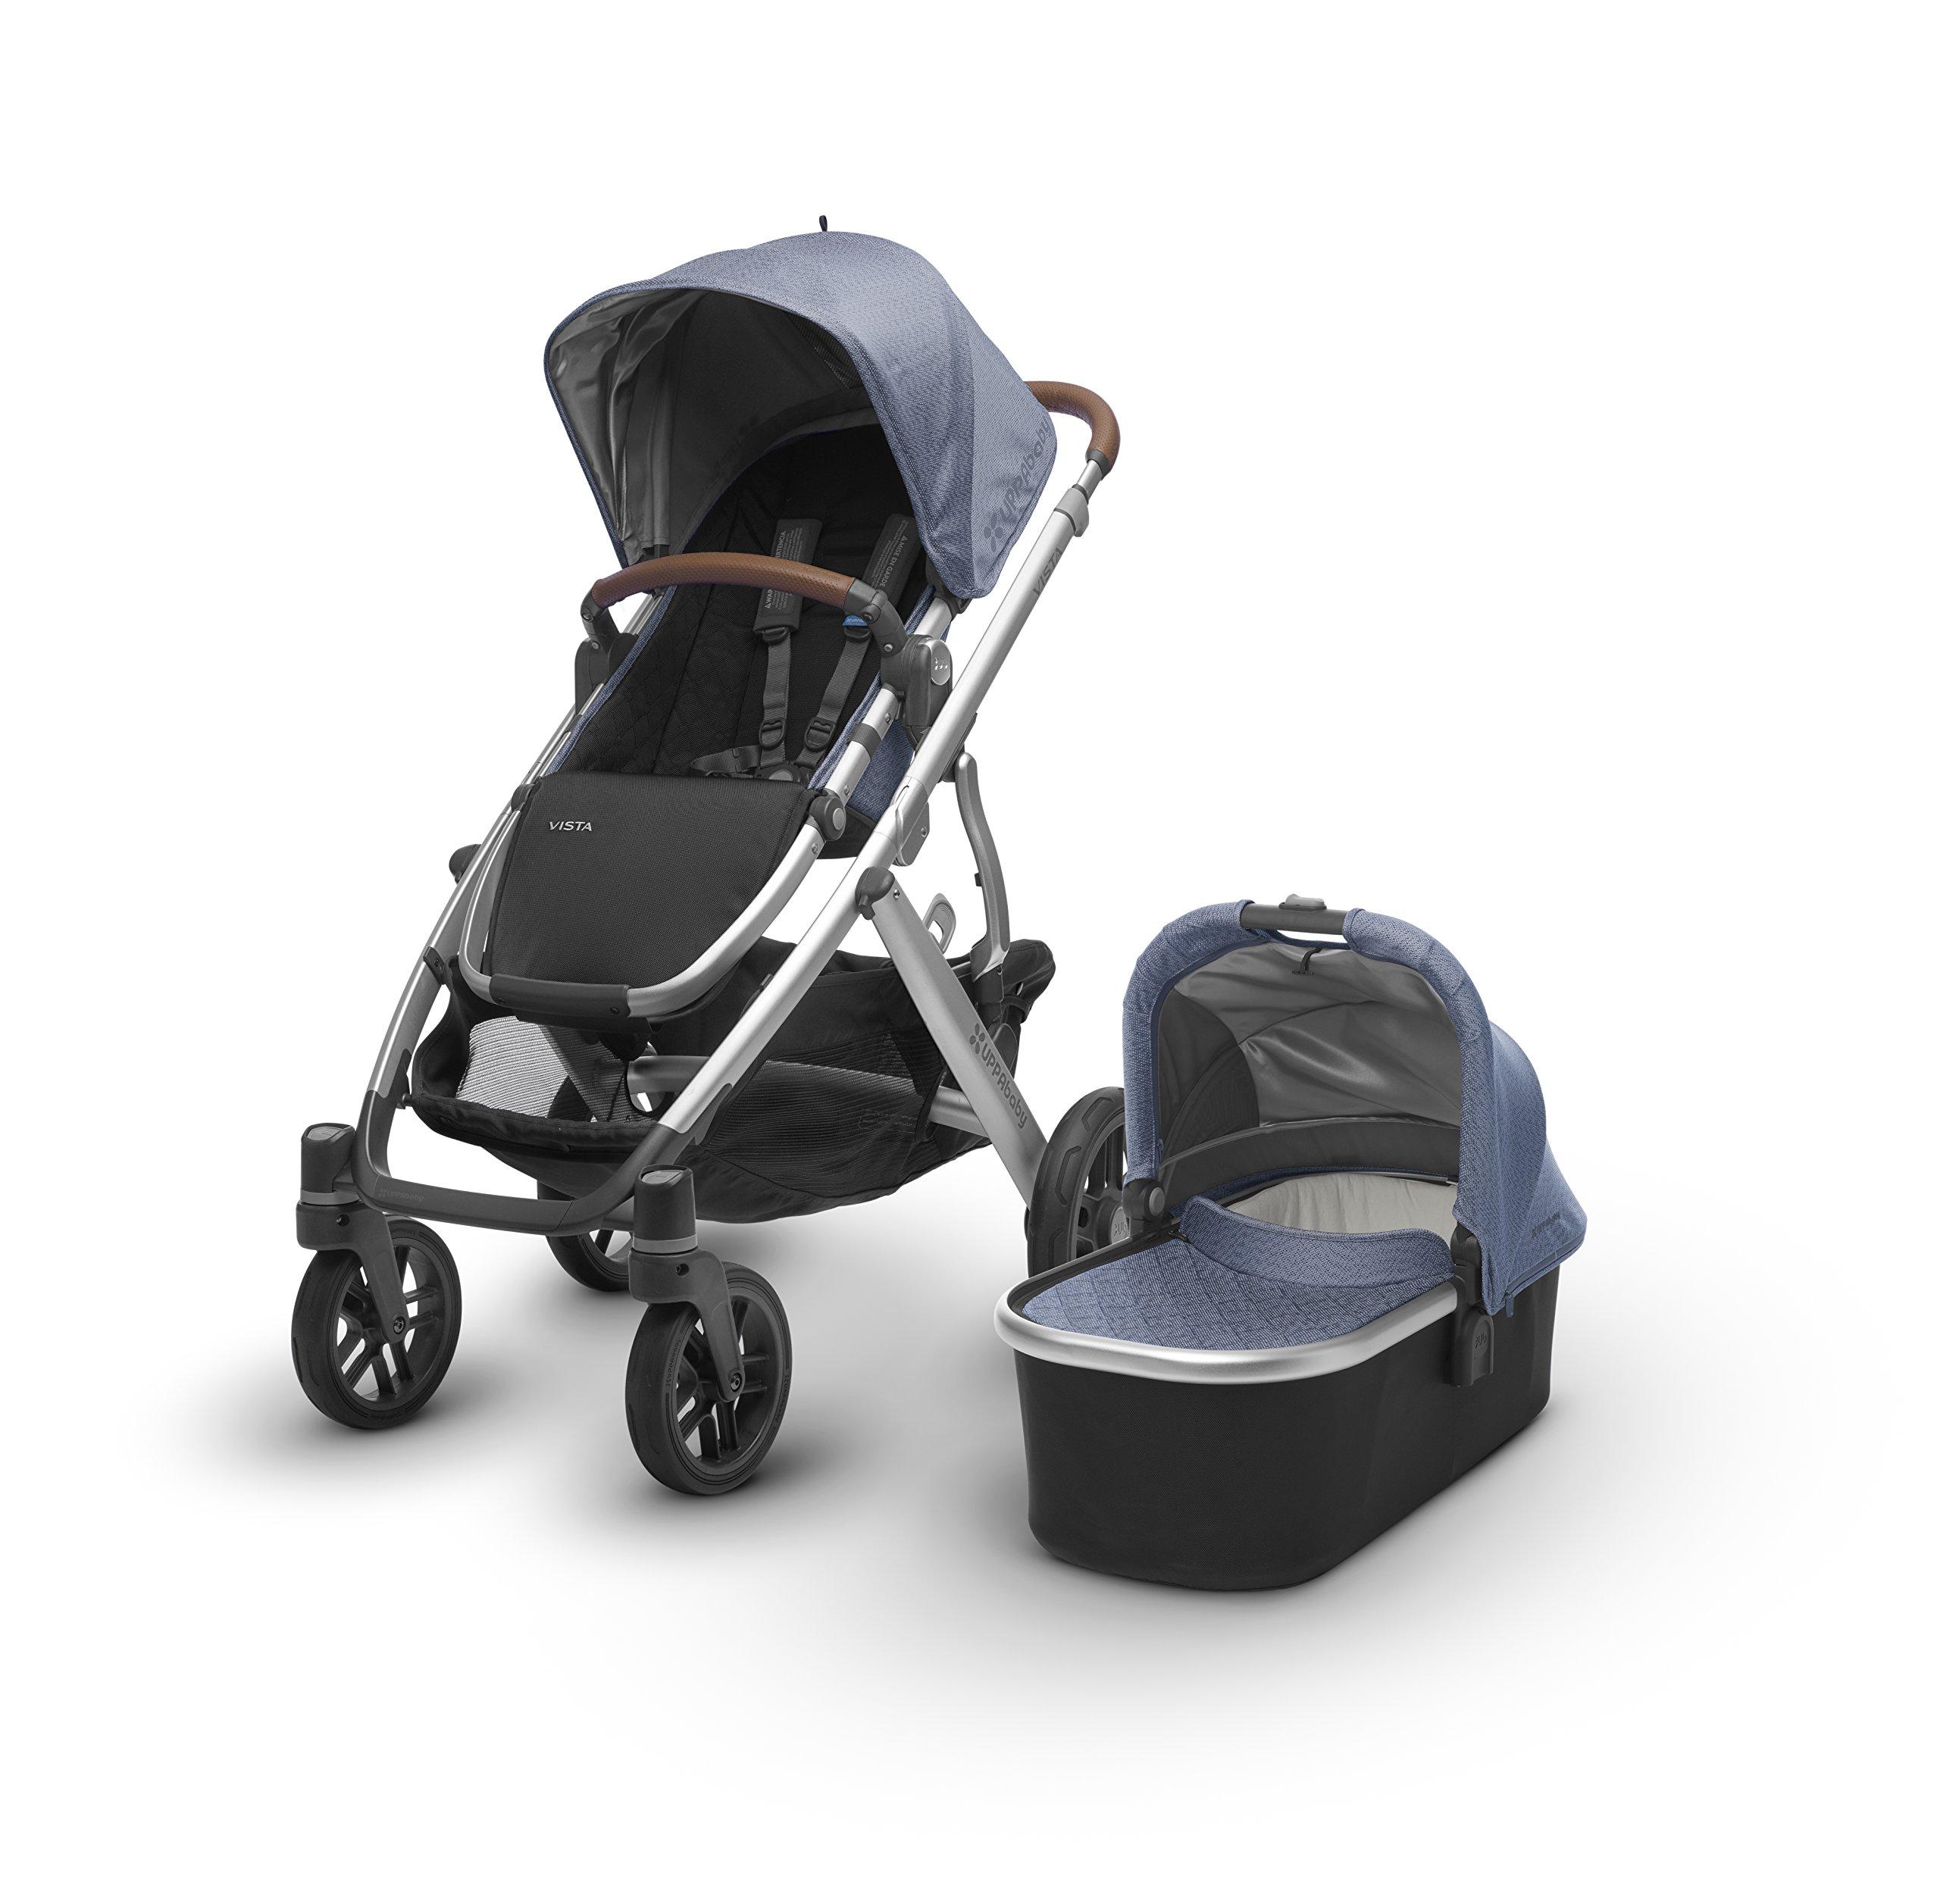 2018 UPPAbaby Vista Stroller Henry Blue Marl Silver Saddle Leather